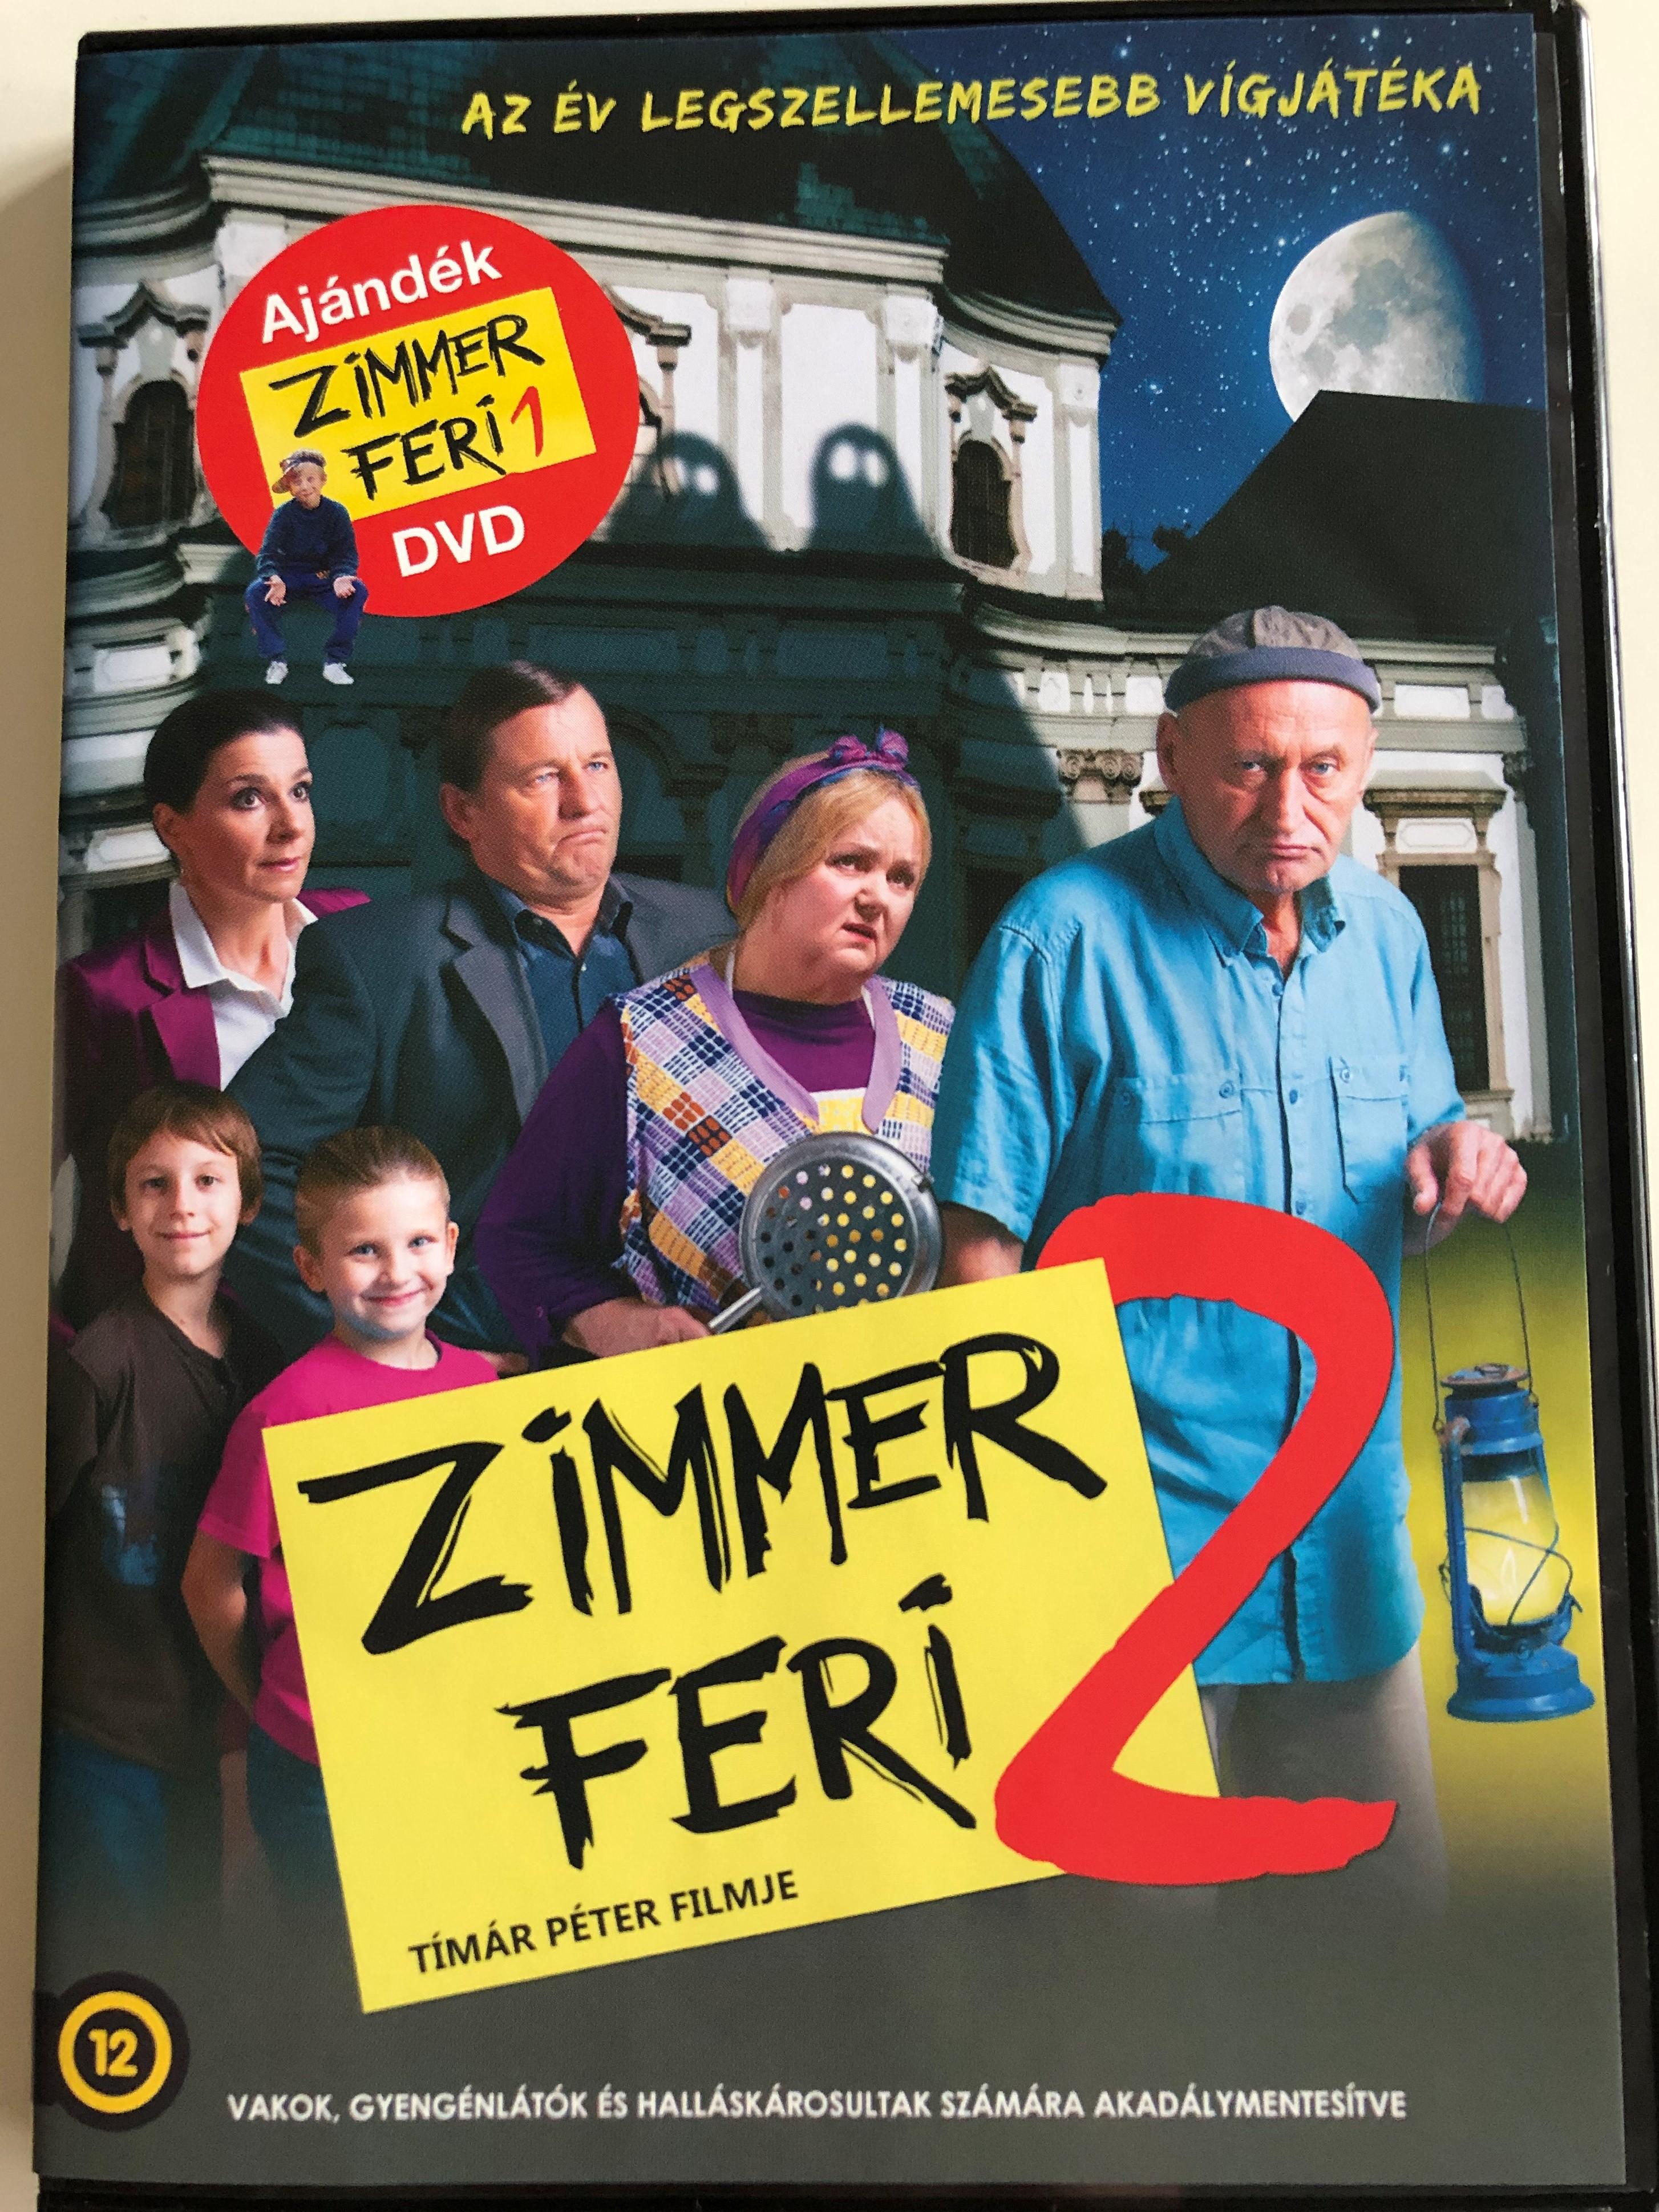 zimmer-feri-2-dvd-2010-aj-nd-k-zimmer-feri-1-1.jpg